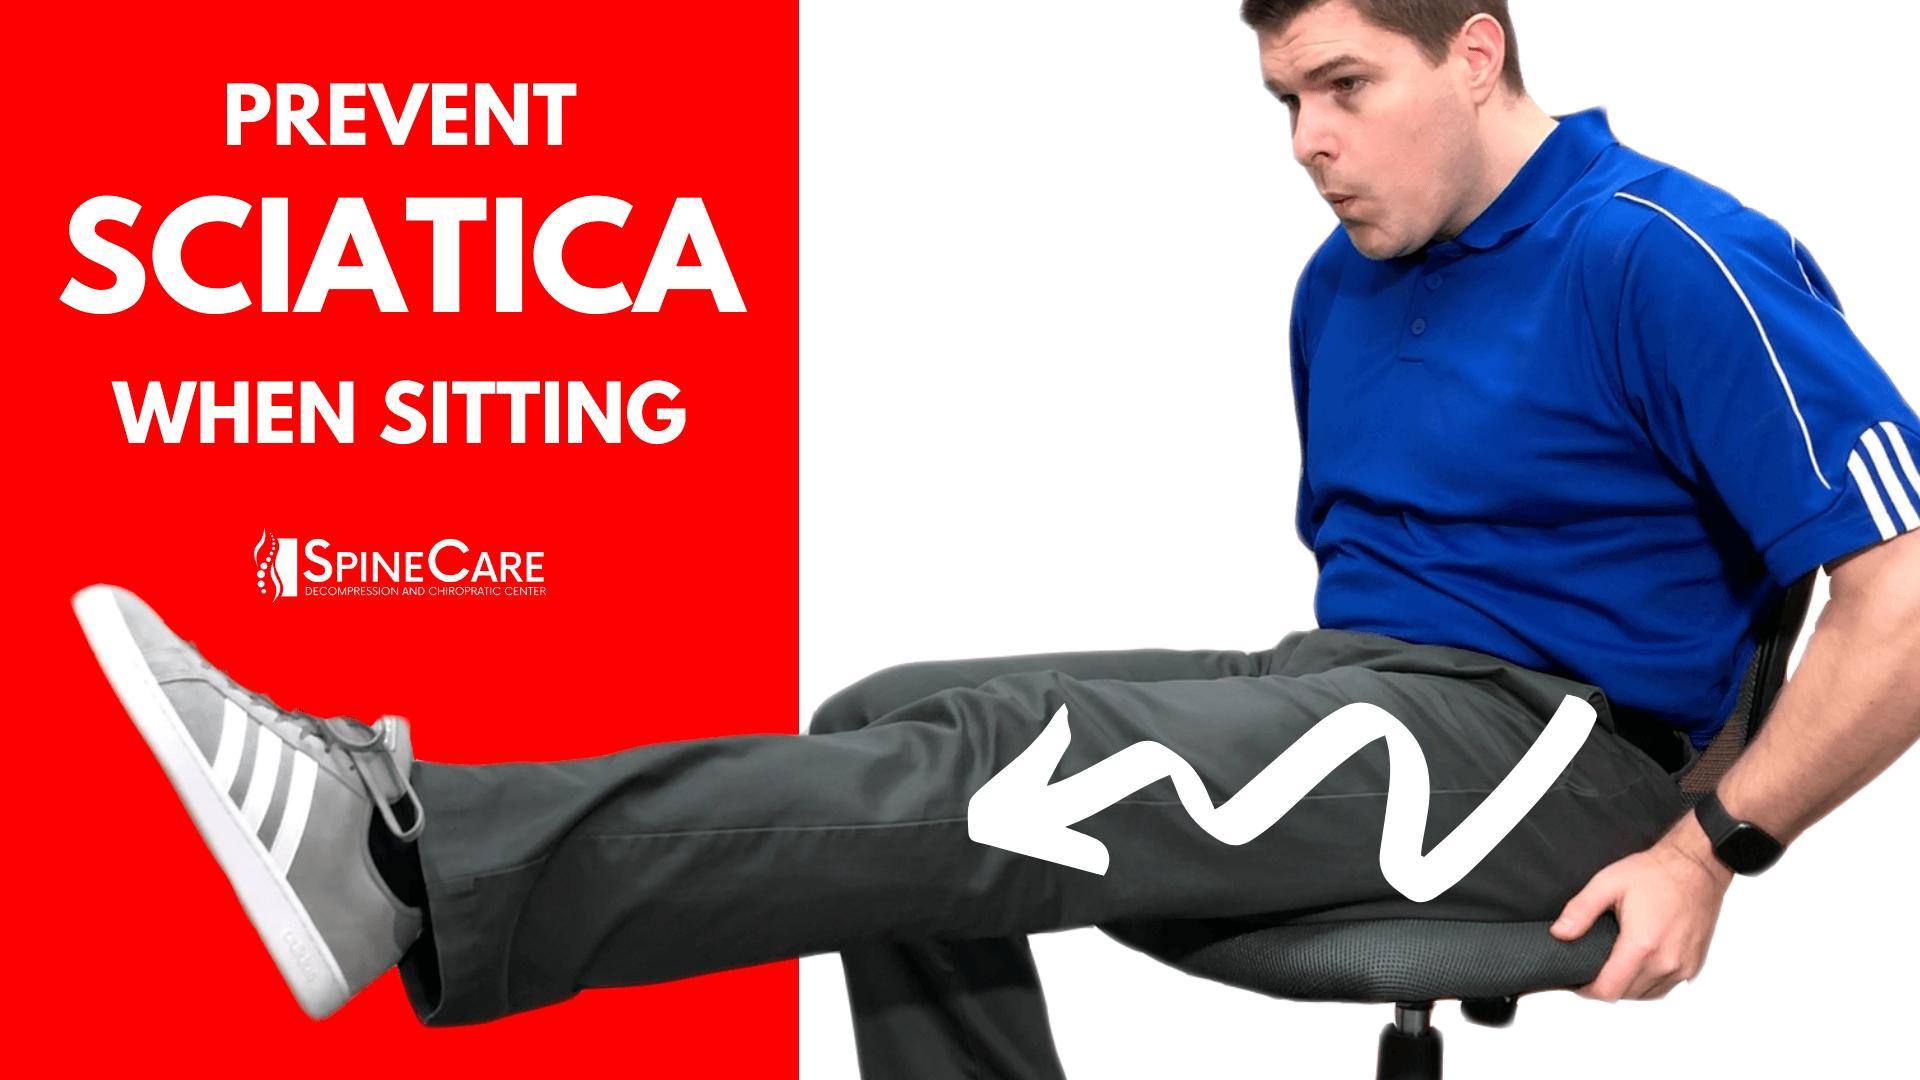 How to Prevent Sciatica Pain When Sitting | St. Joseph, MI Chiropractor | SpineCare